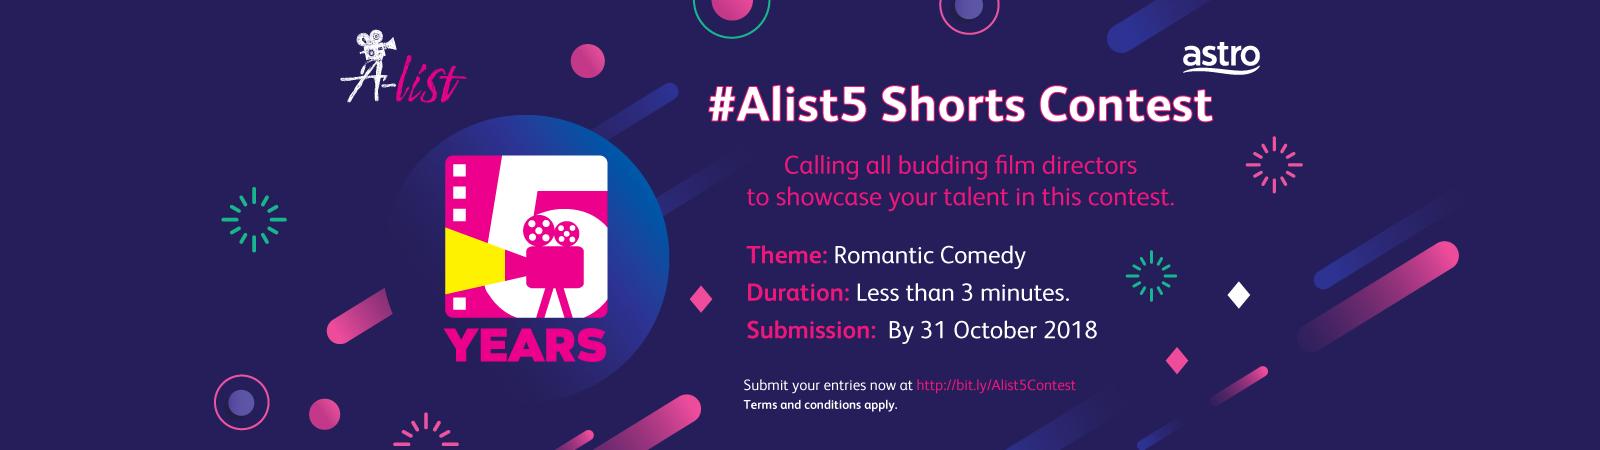 #Alist5 Shorts Contest